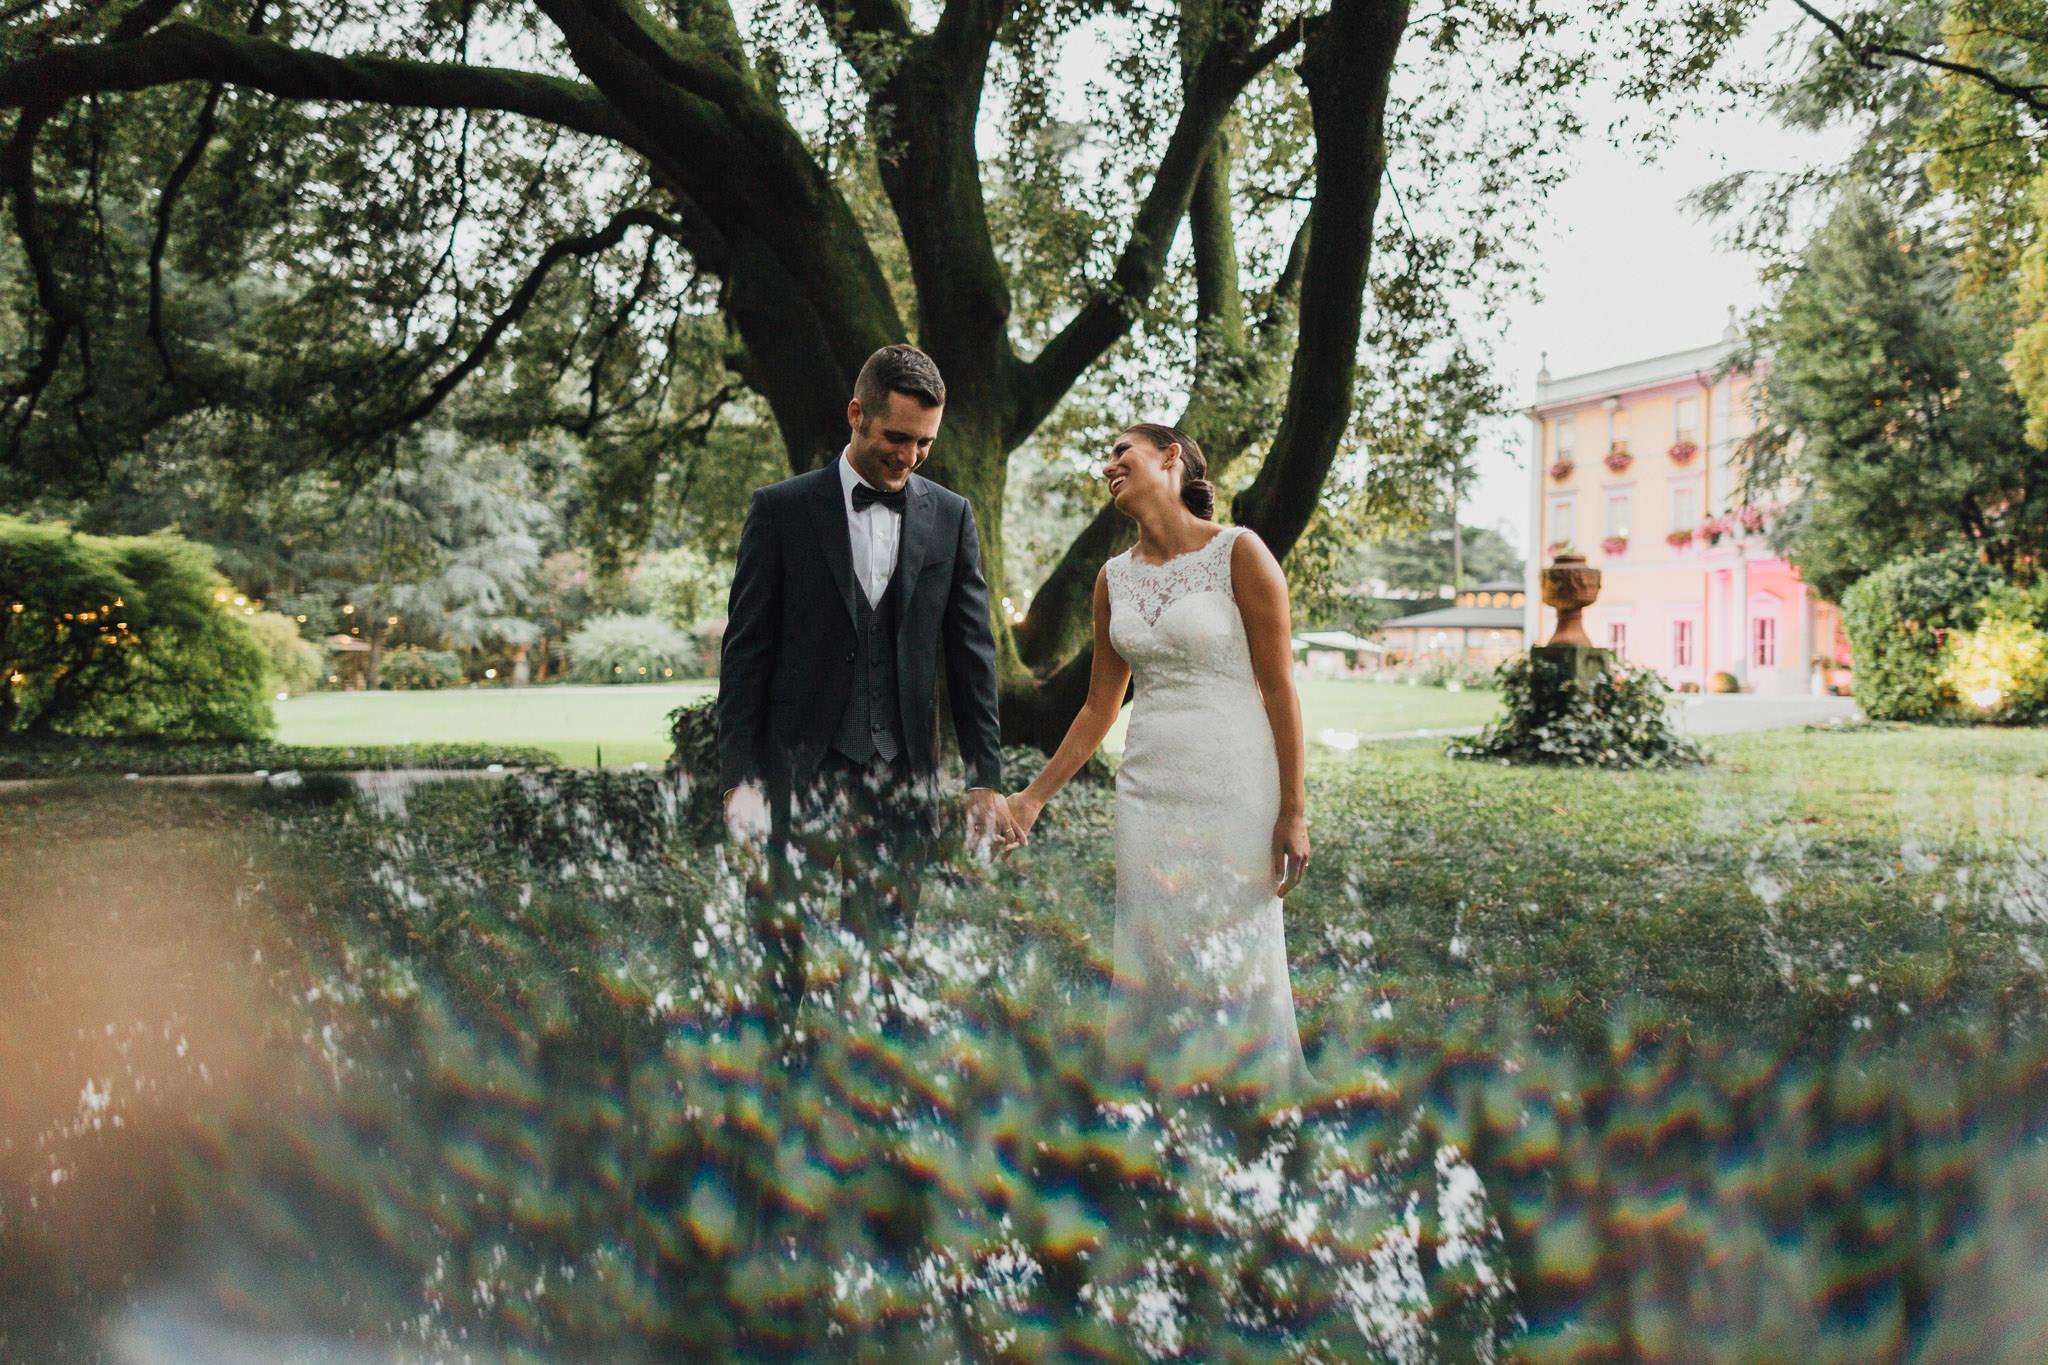 fotografia_di_matrimonio_portfolio-1021